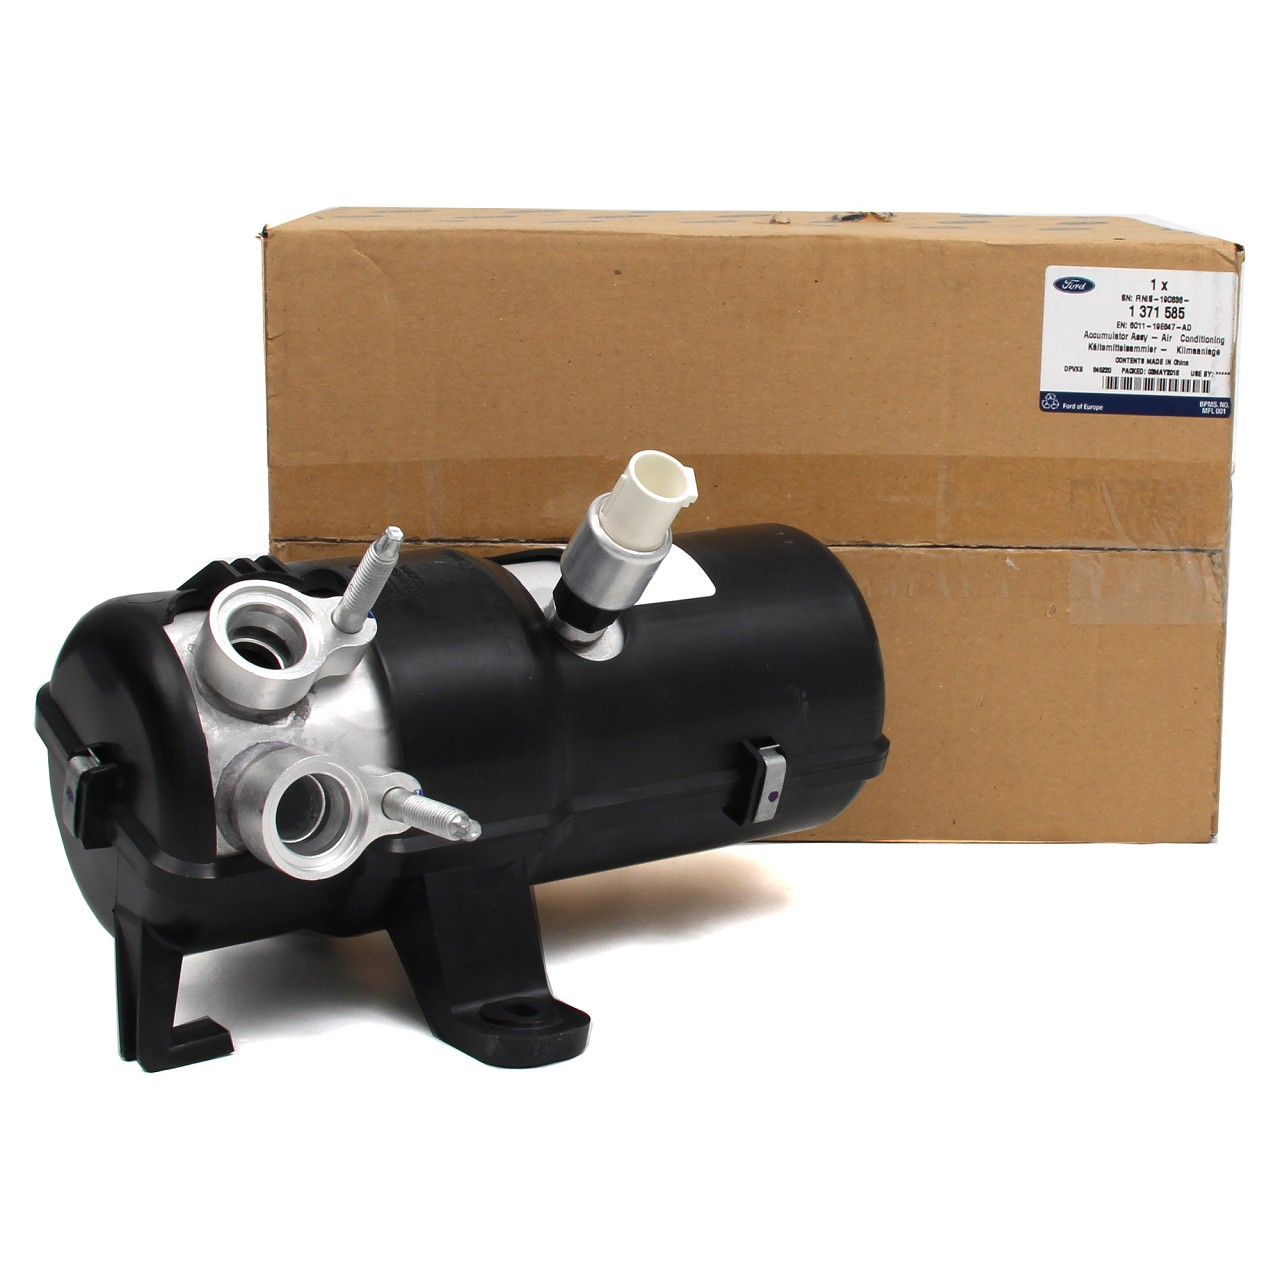 ORIGINAL Ford Trockner Klimaanlage Klimatrockner TRANSIT 2.2/2.4/3.2TDCi 1371585